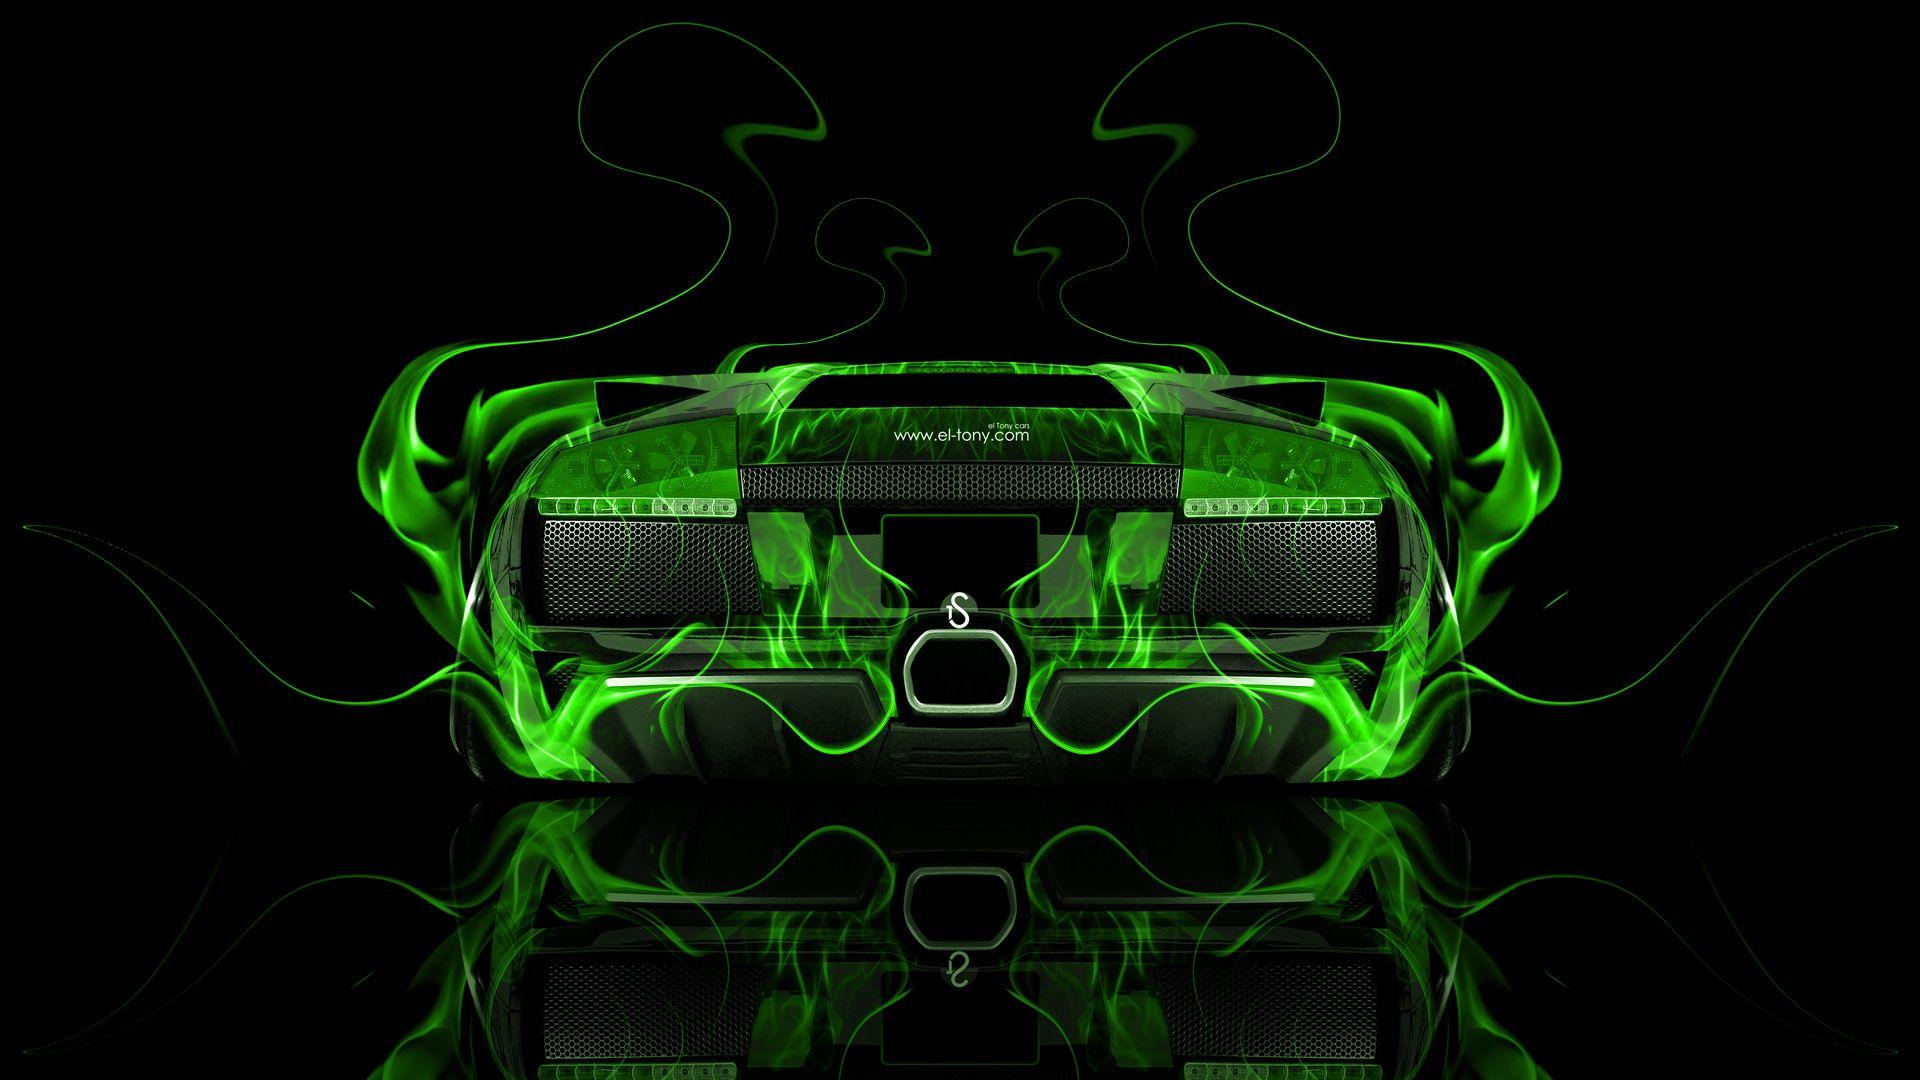 Great Lamborghini Murcielago Back Green Fire Abstract Car 2014